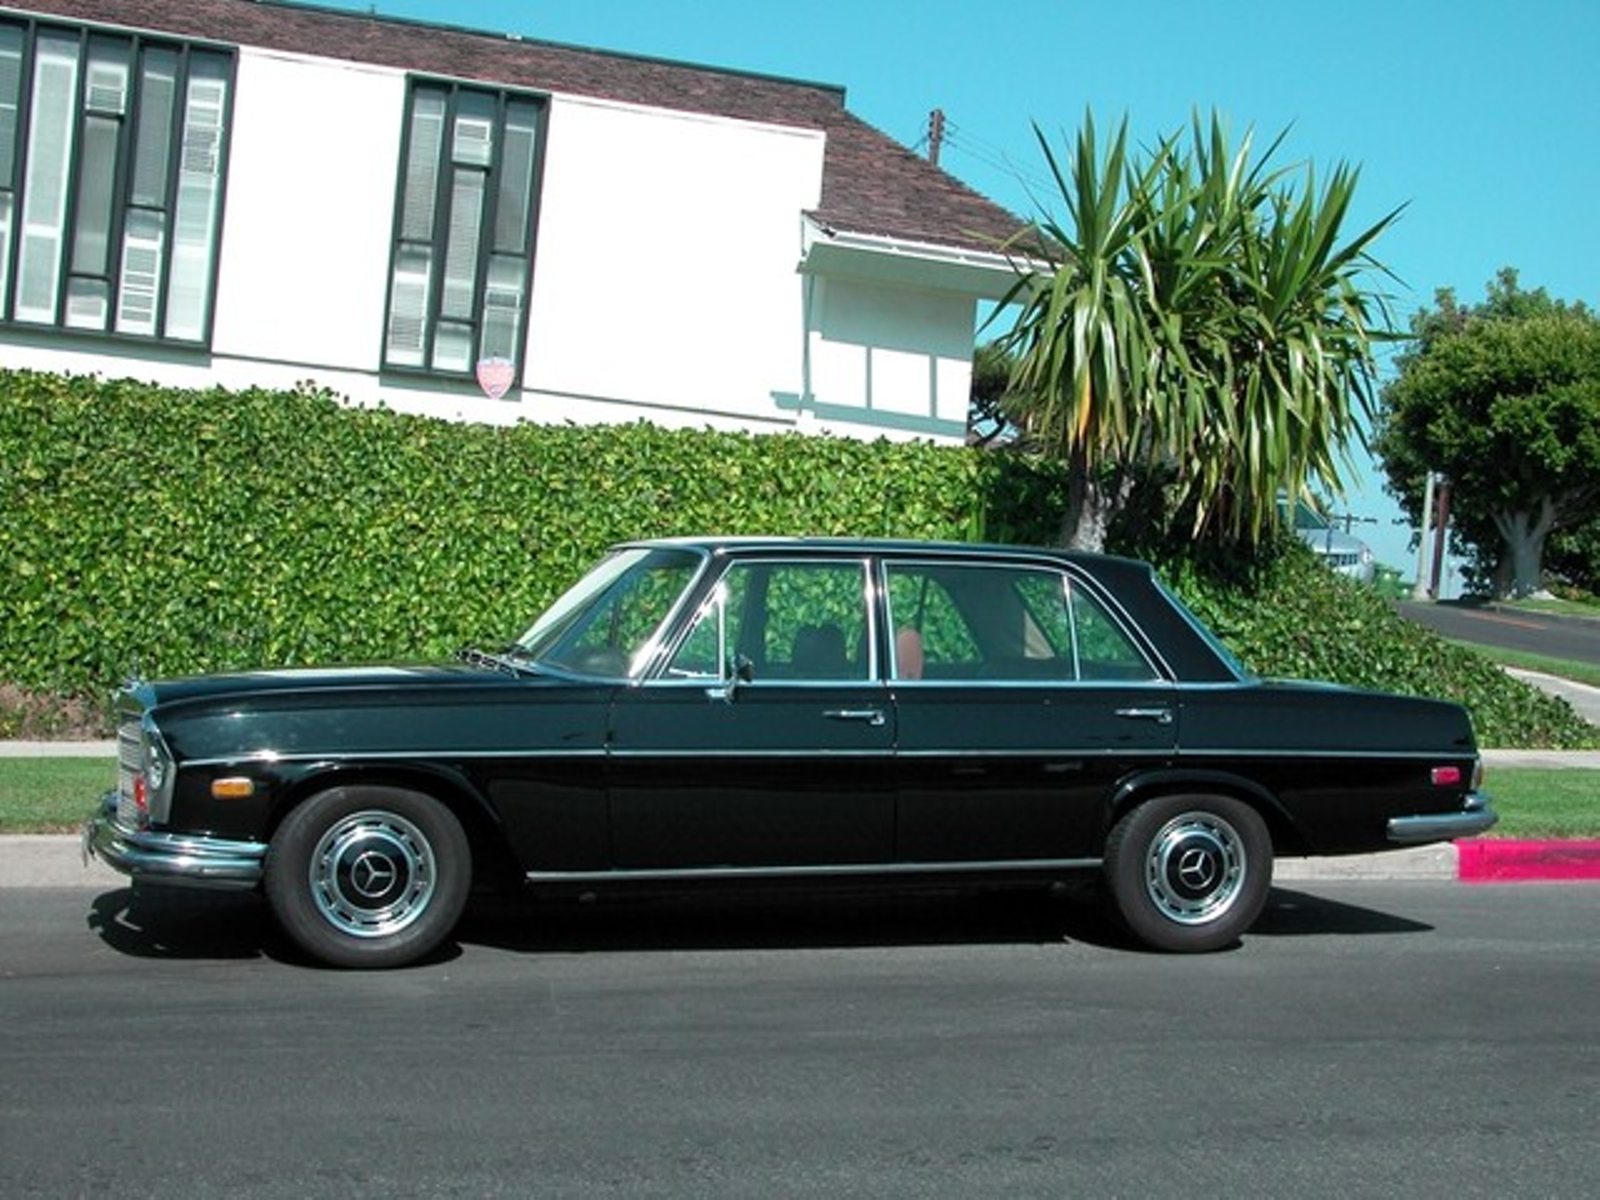 1972 mercedes benz 280 sel 45 super clean collectible for Mercedes benz roseville ca